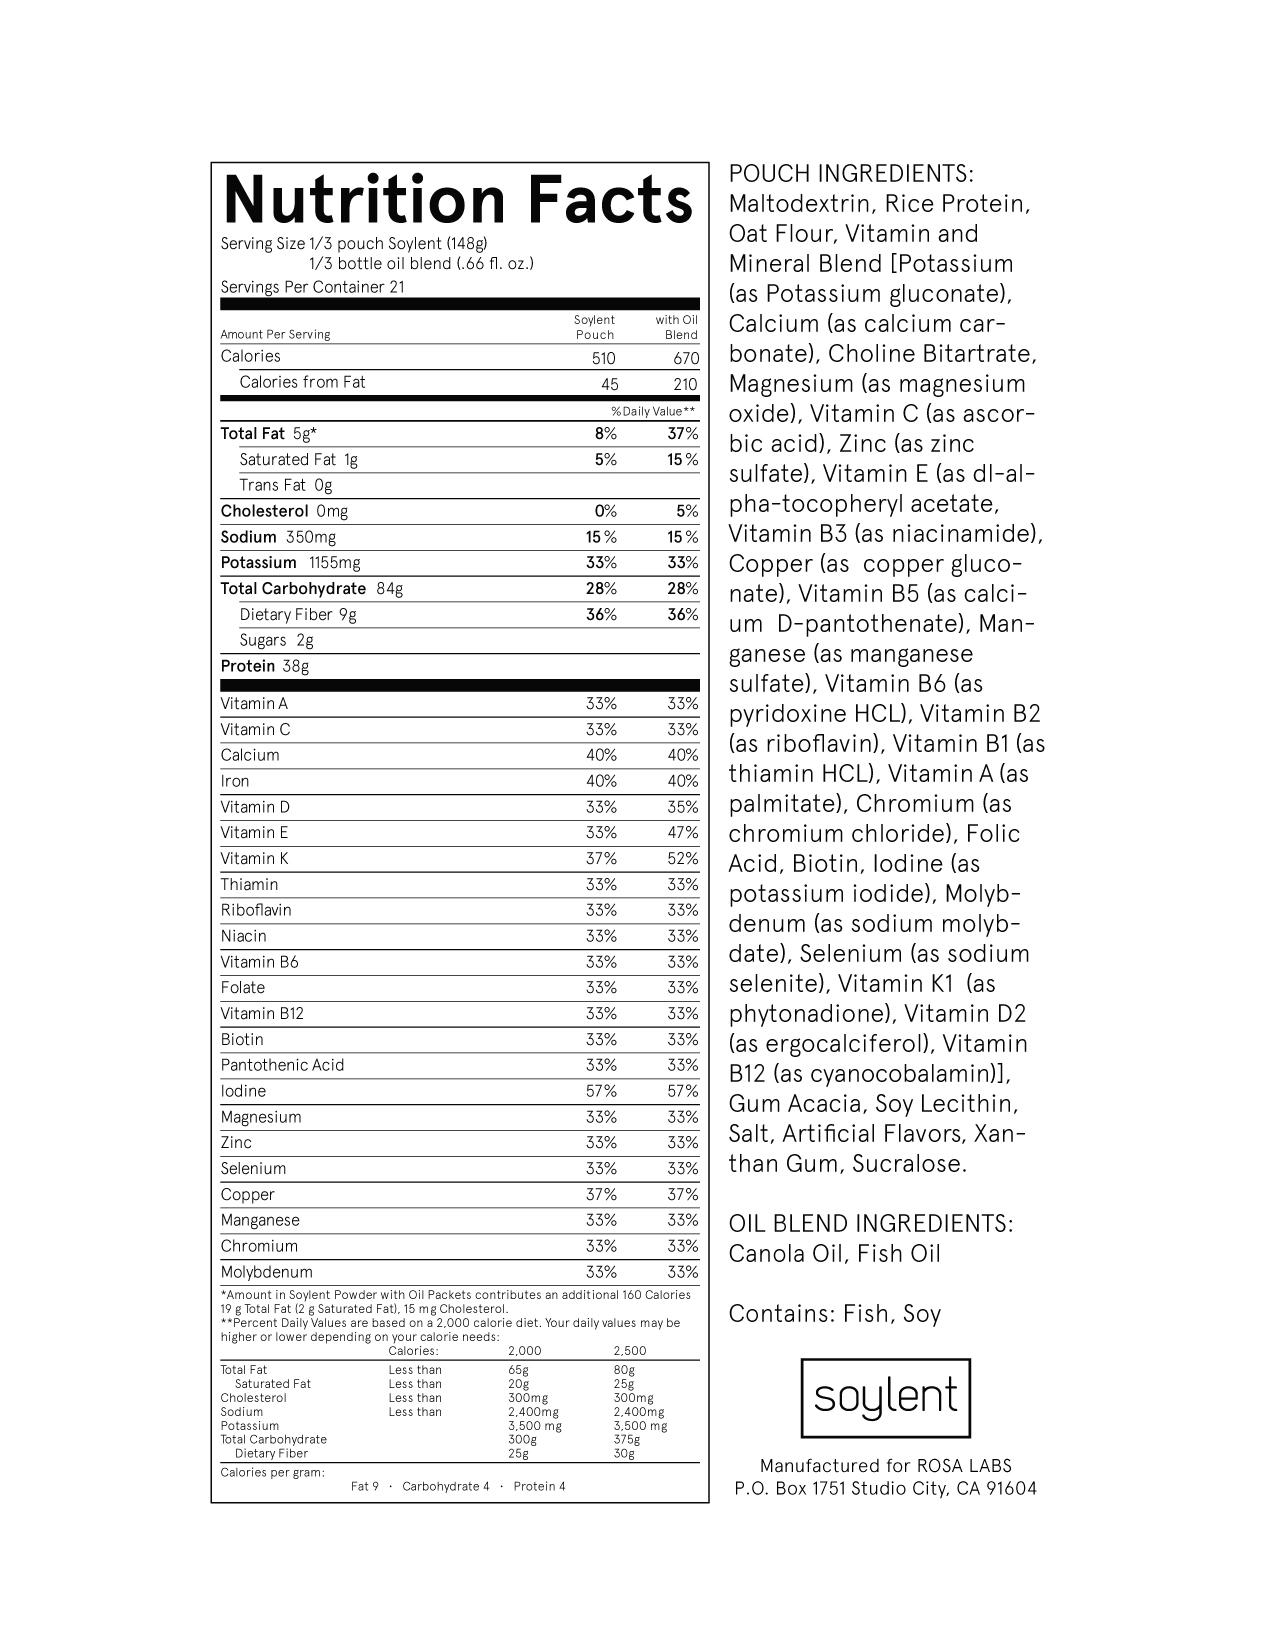 Bild1_NutritionFacts